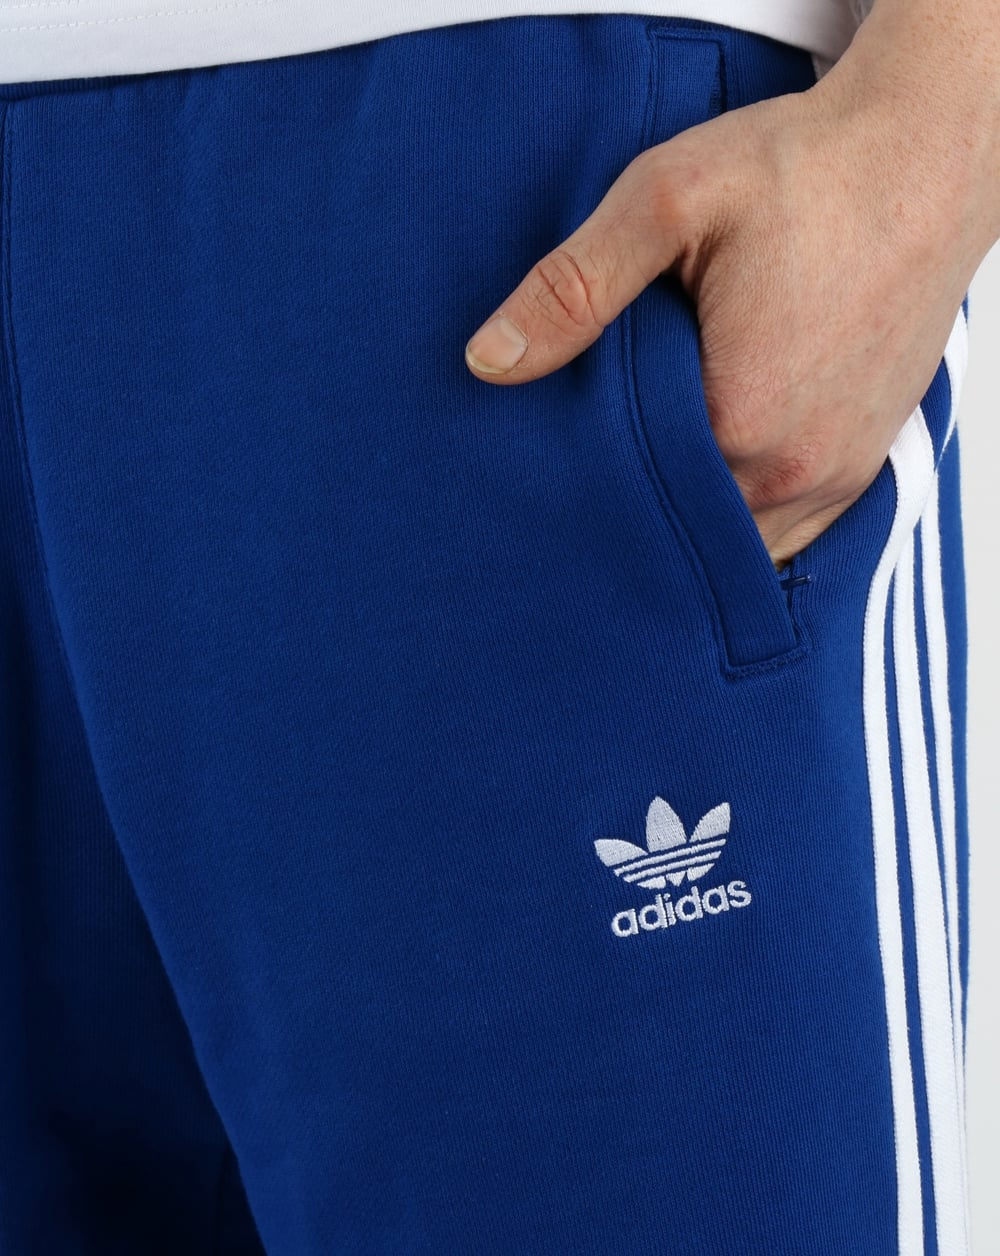 adidas beckenbauer track pants royal